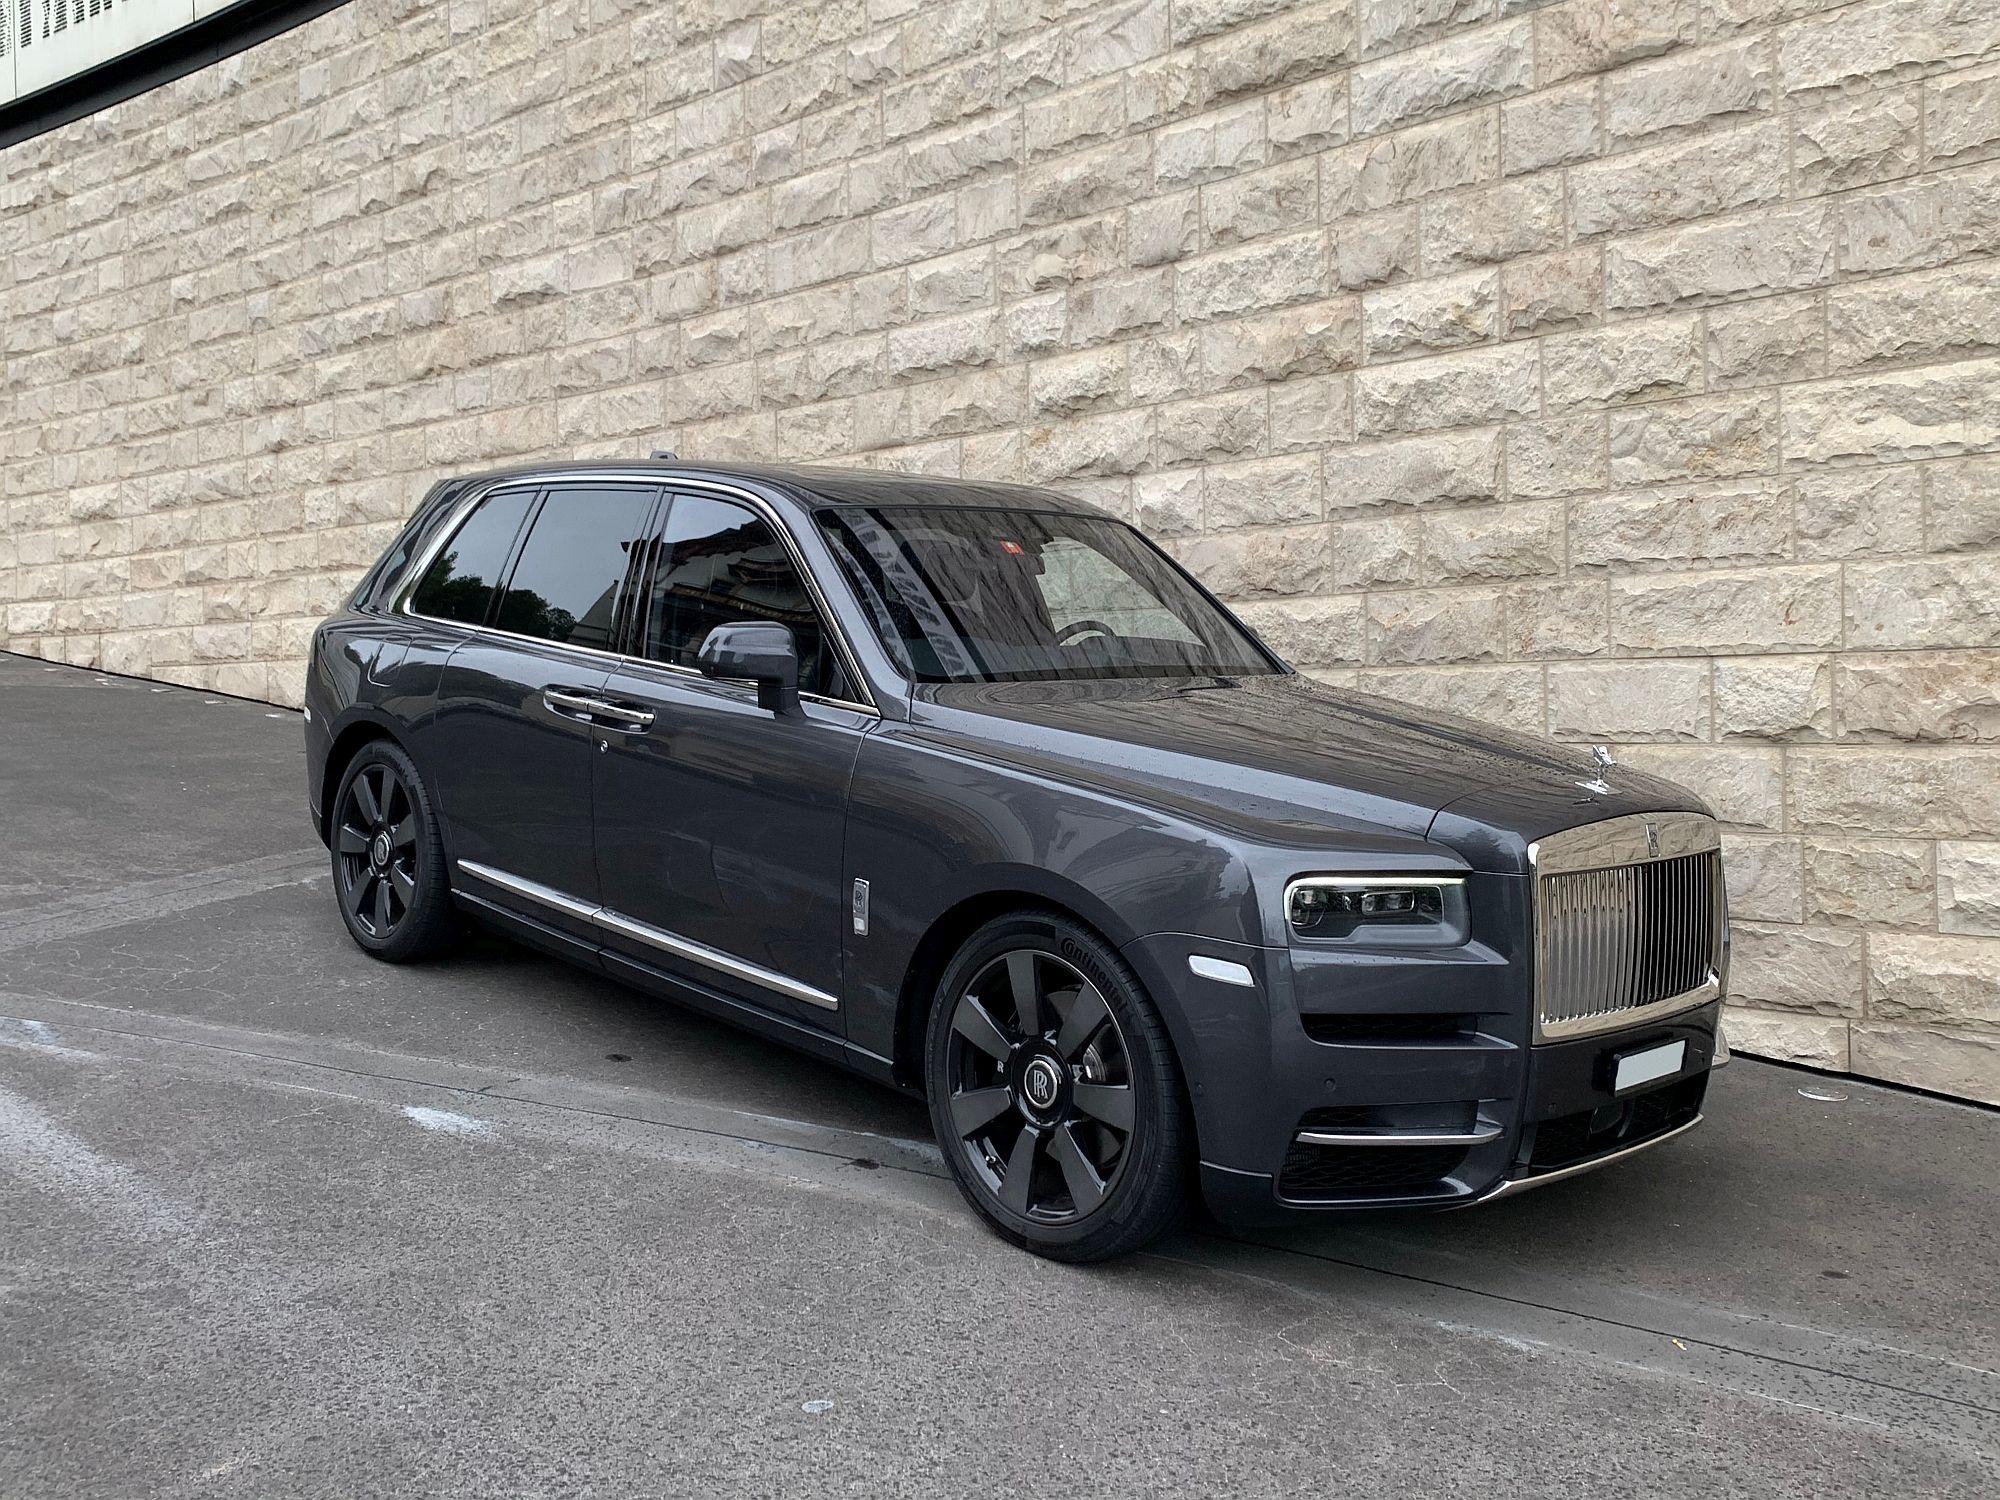 Rolls Royce Cullinan mieten